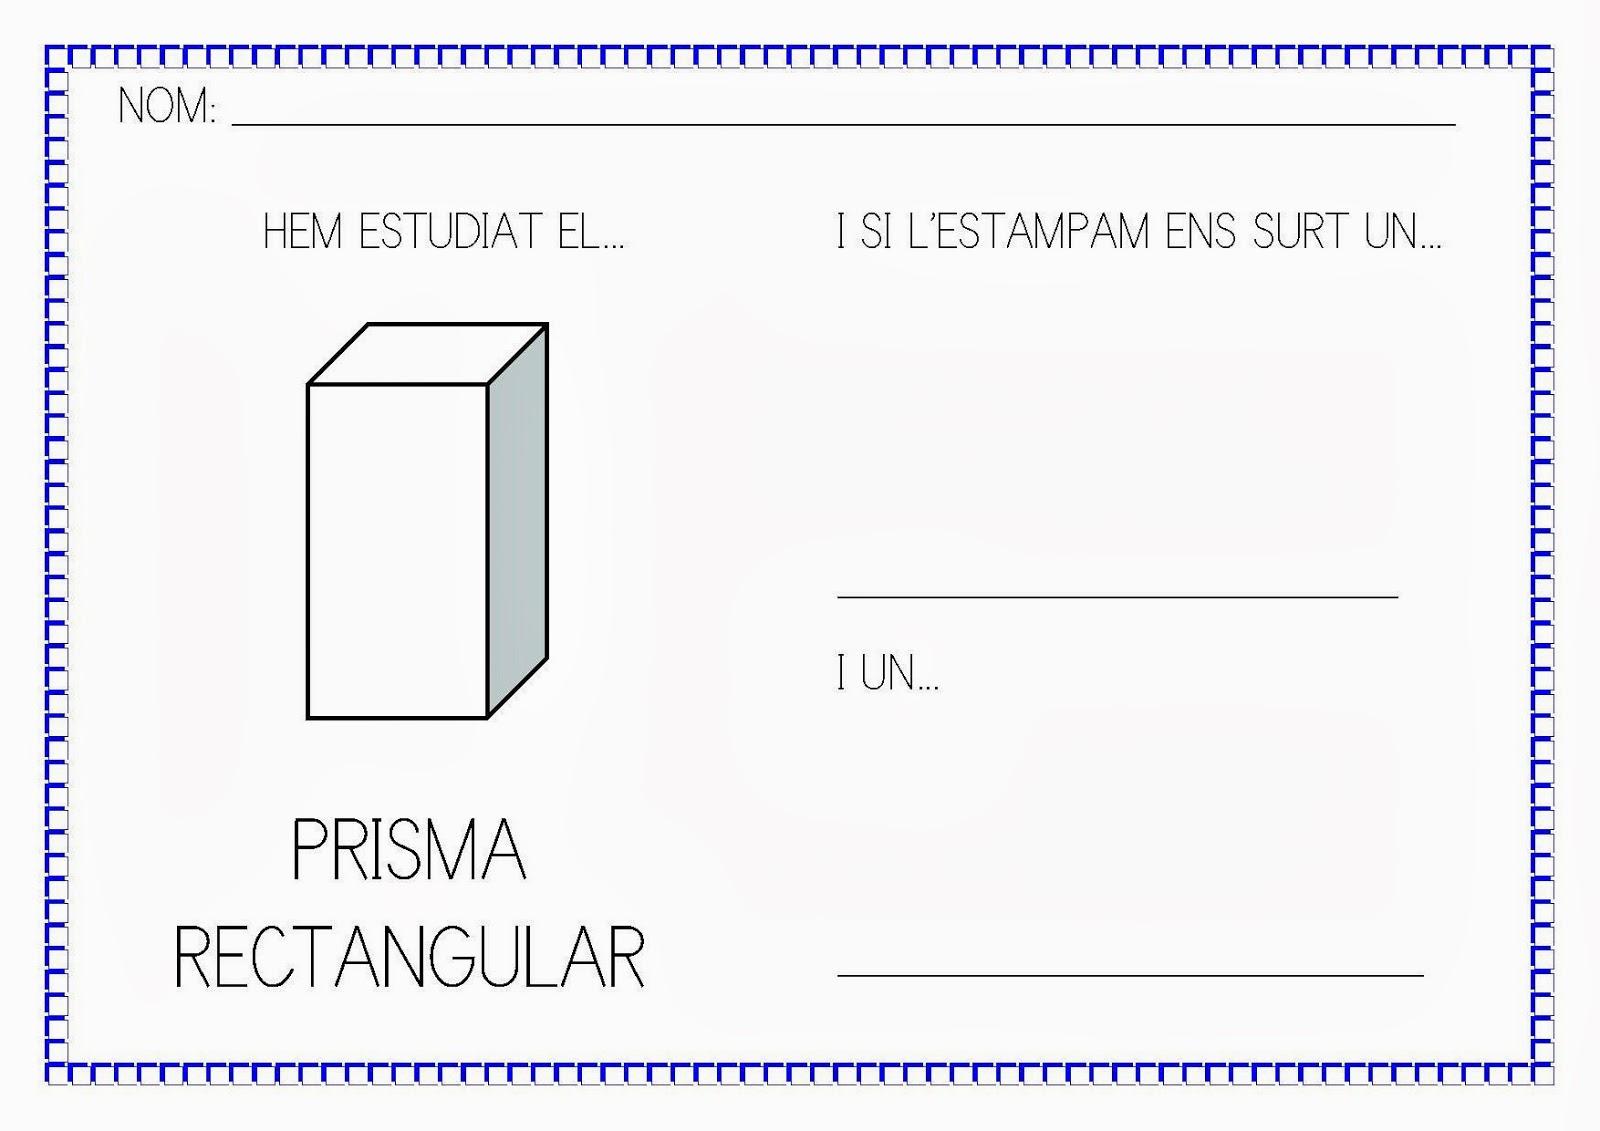 Triangular Prism Template